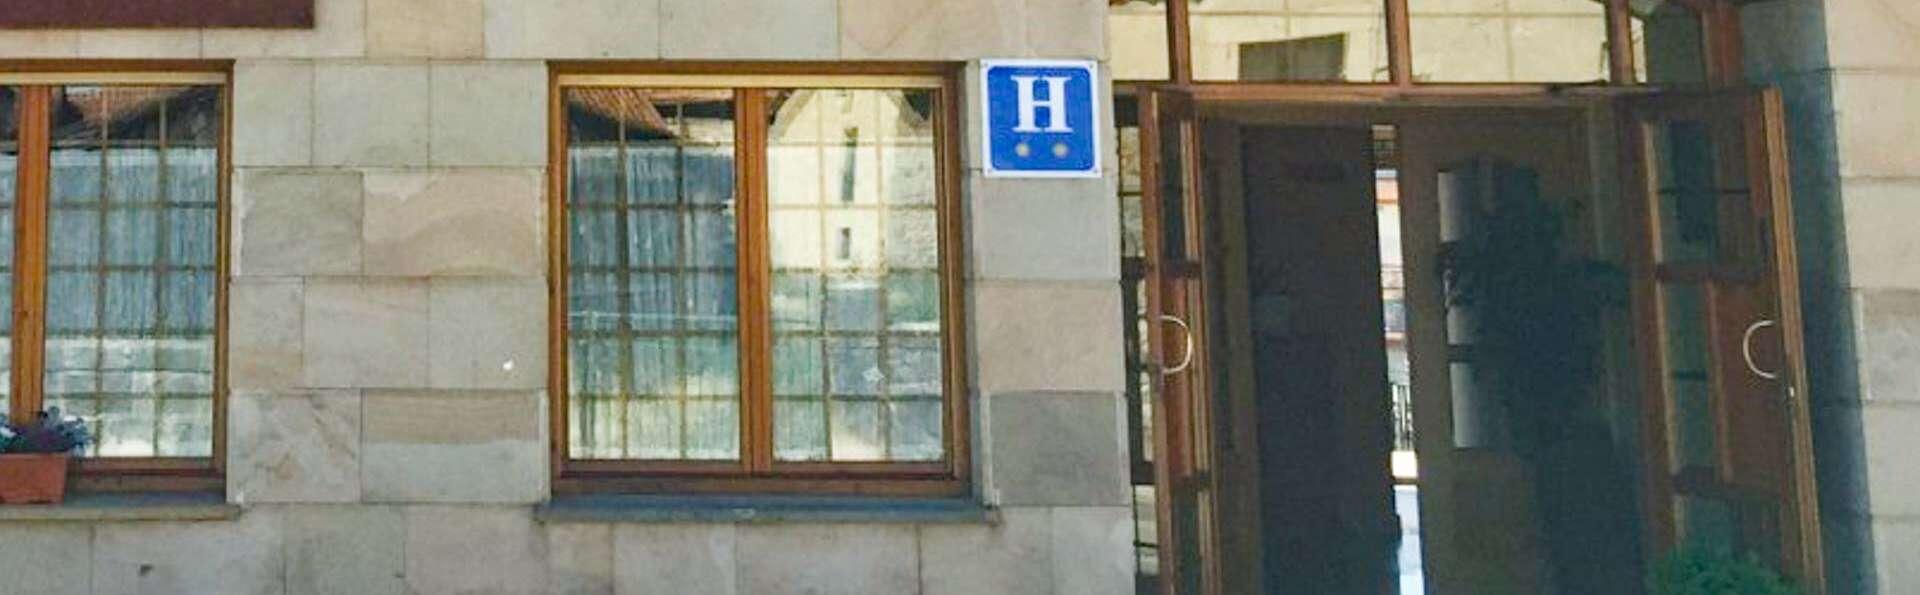 Hotel Alvargonzalez - EDIT_ENTRANCE.jpg